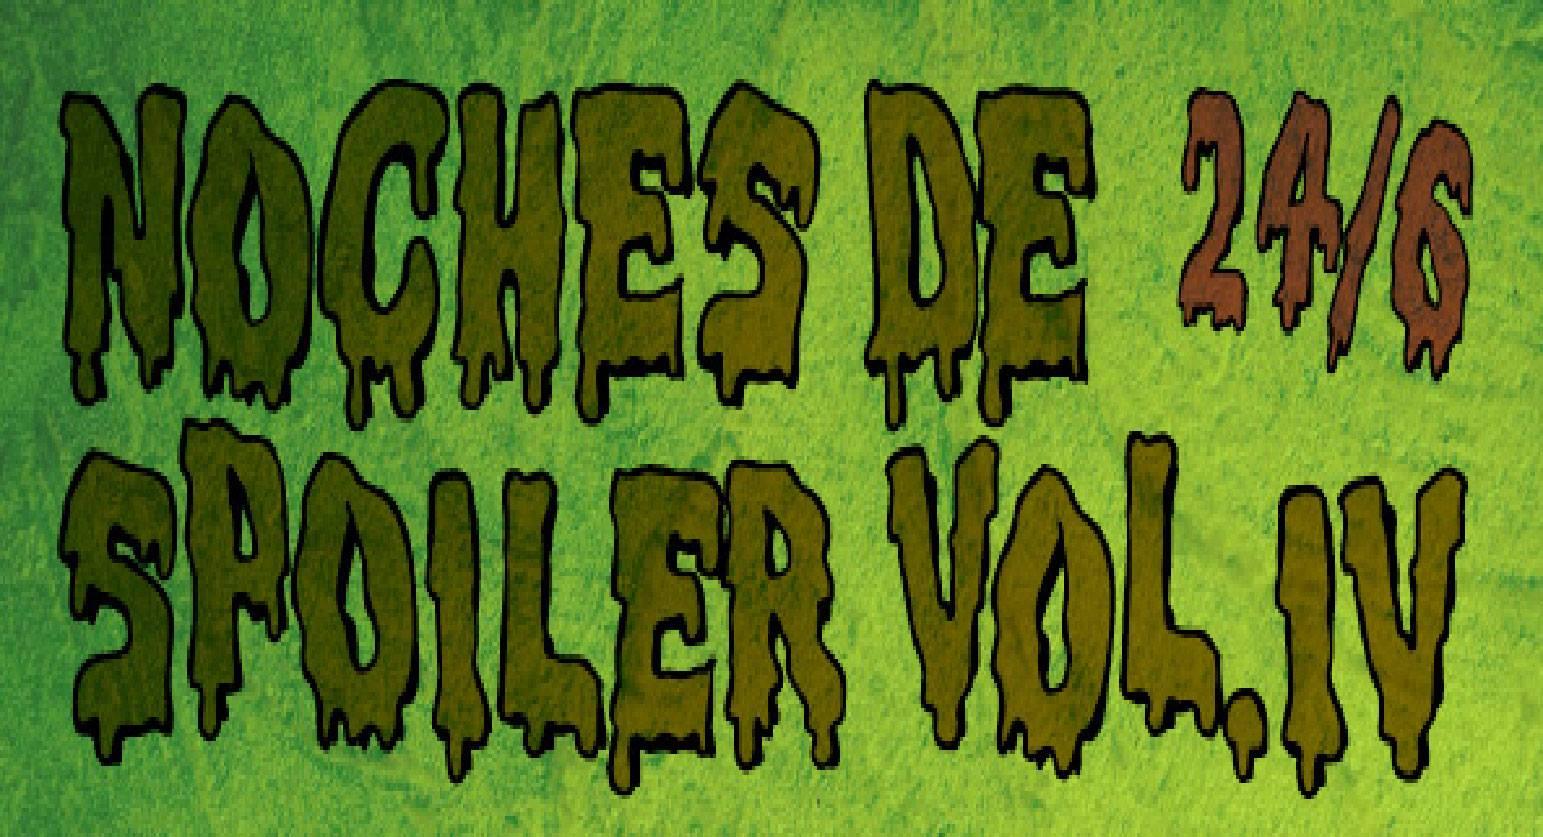 chelospoiler